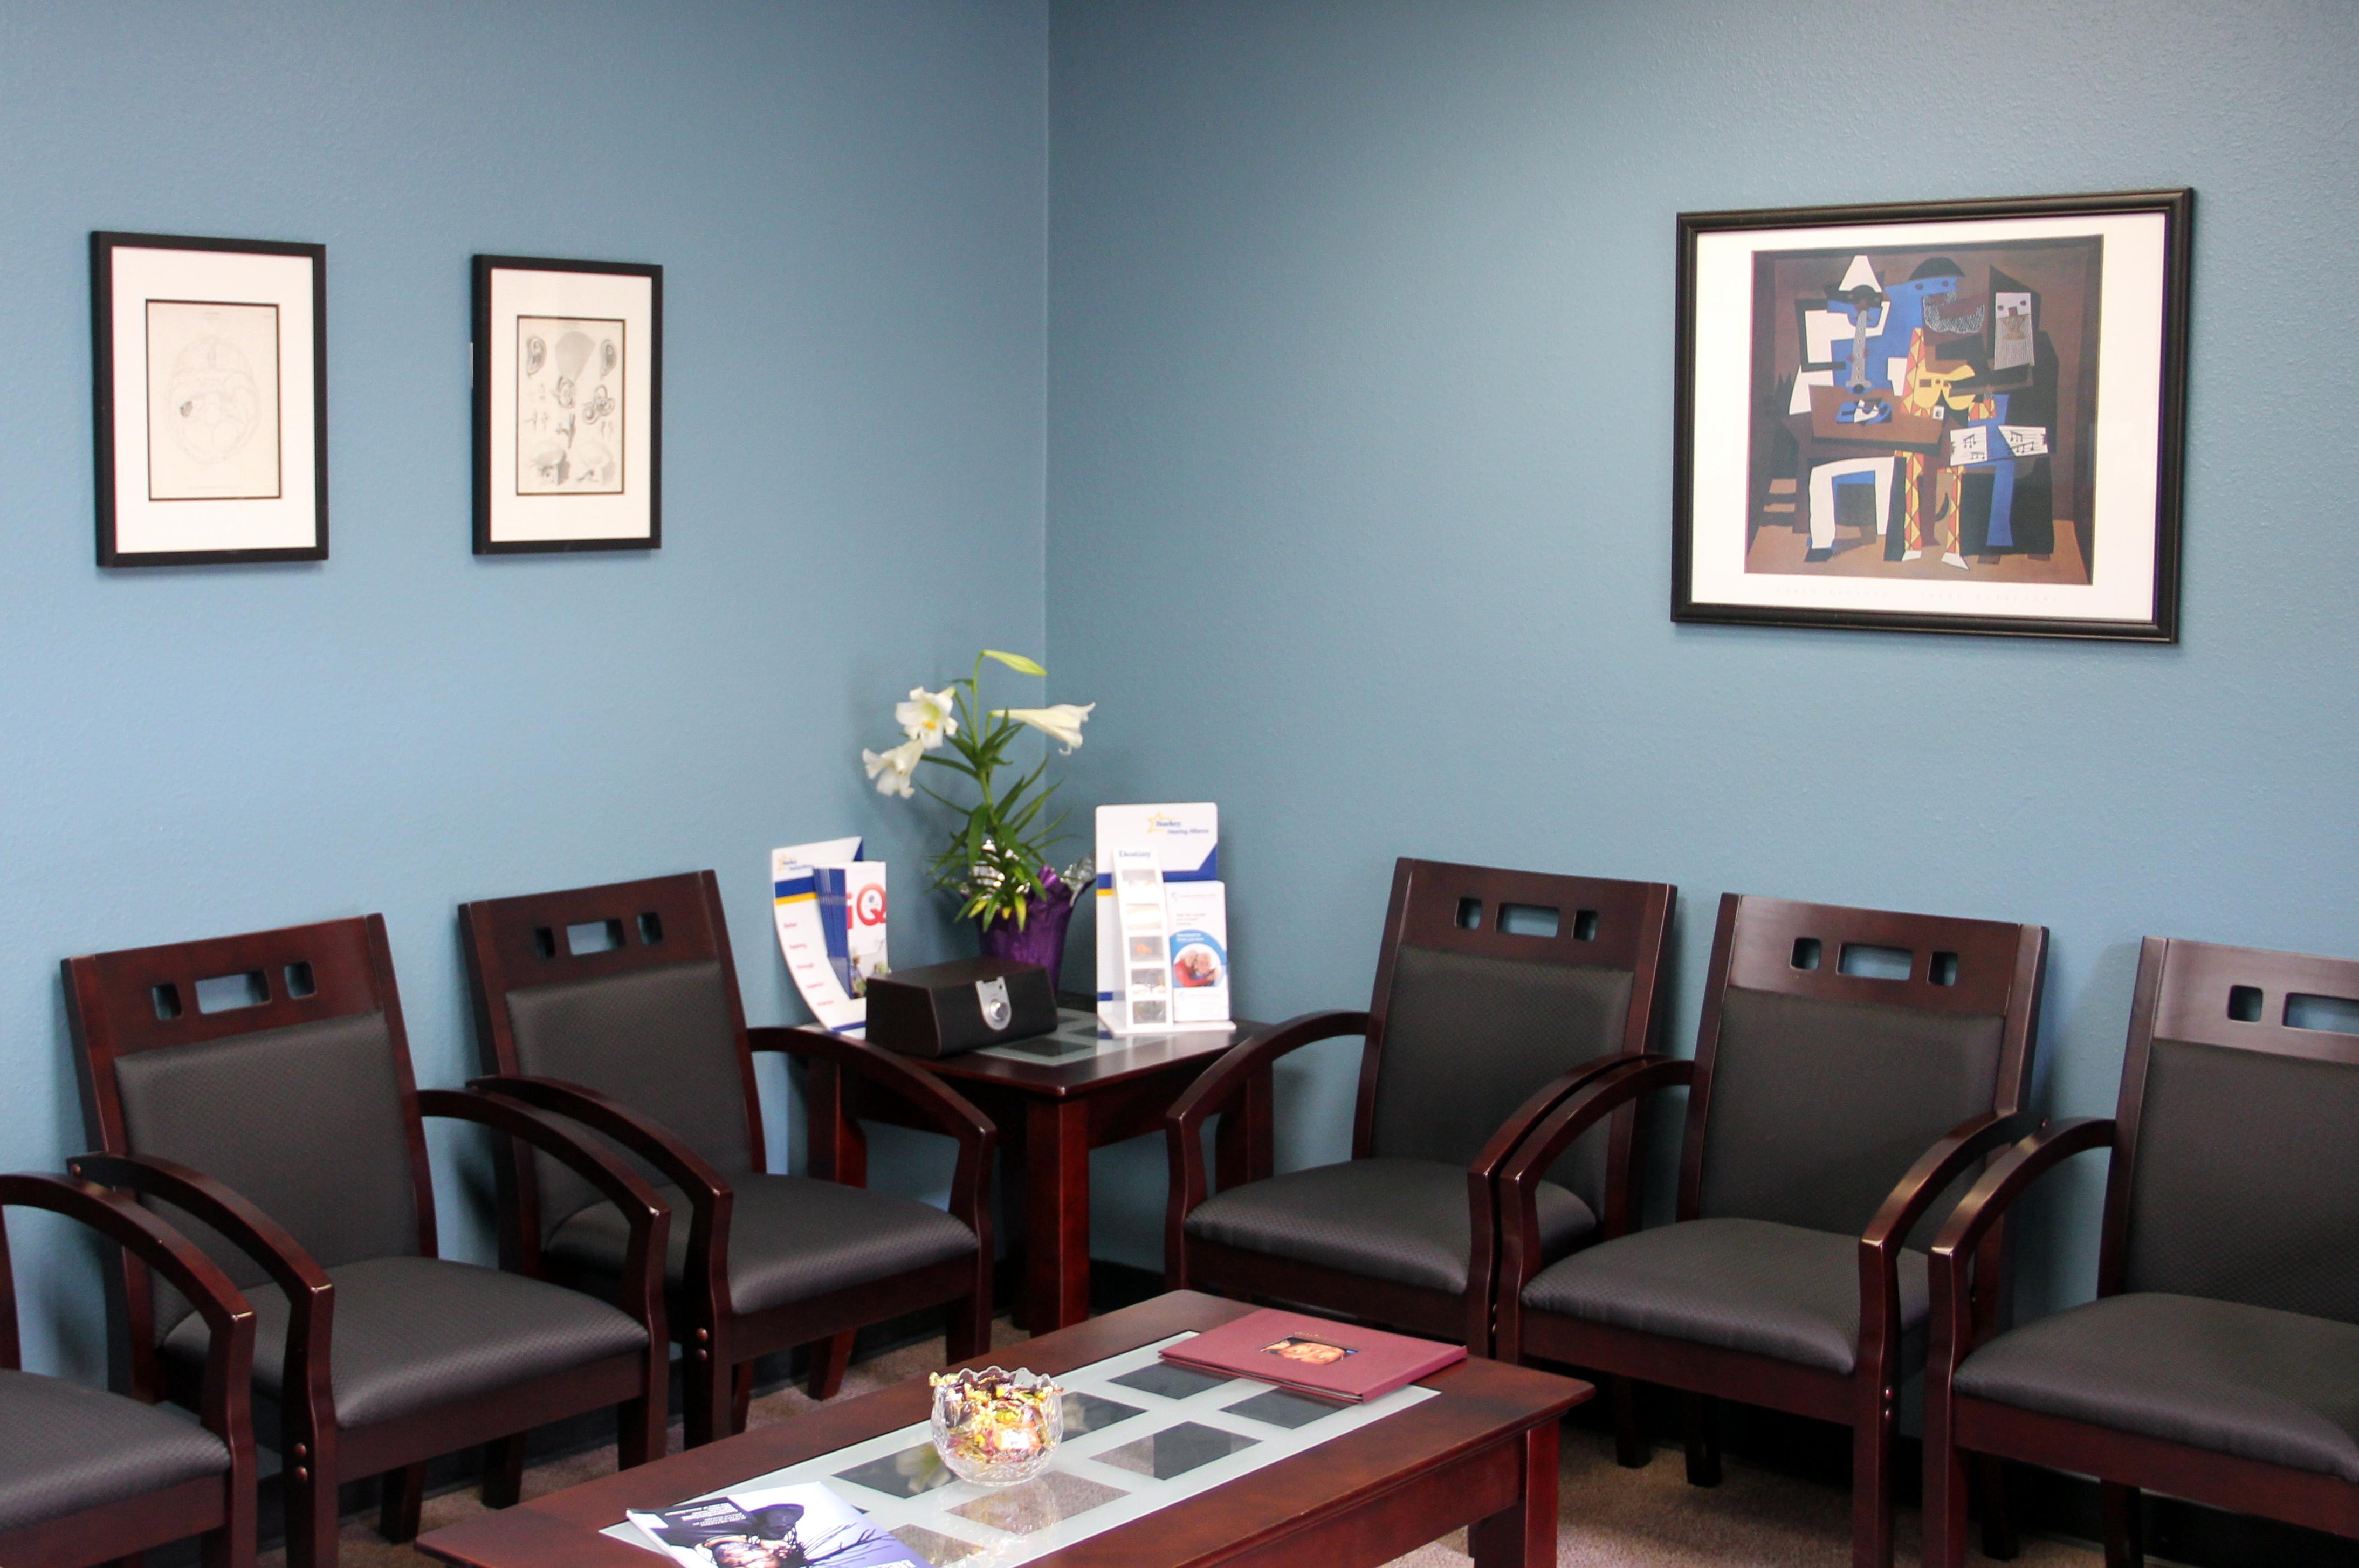 Fidelity Hearing Center image 4